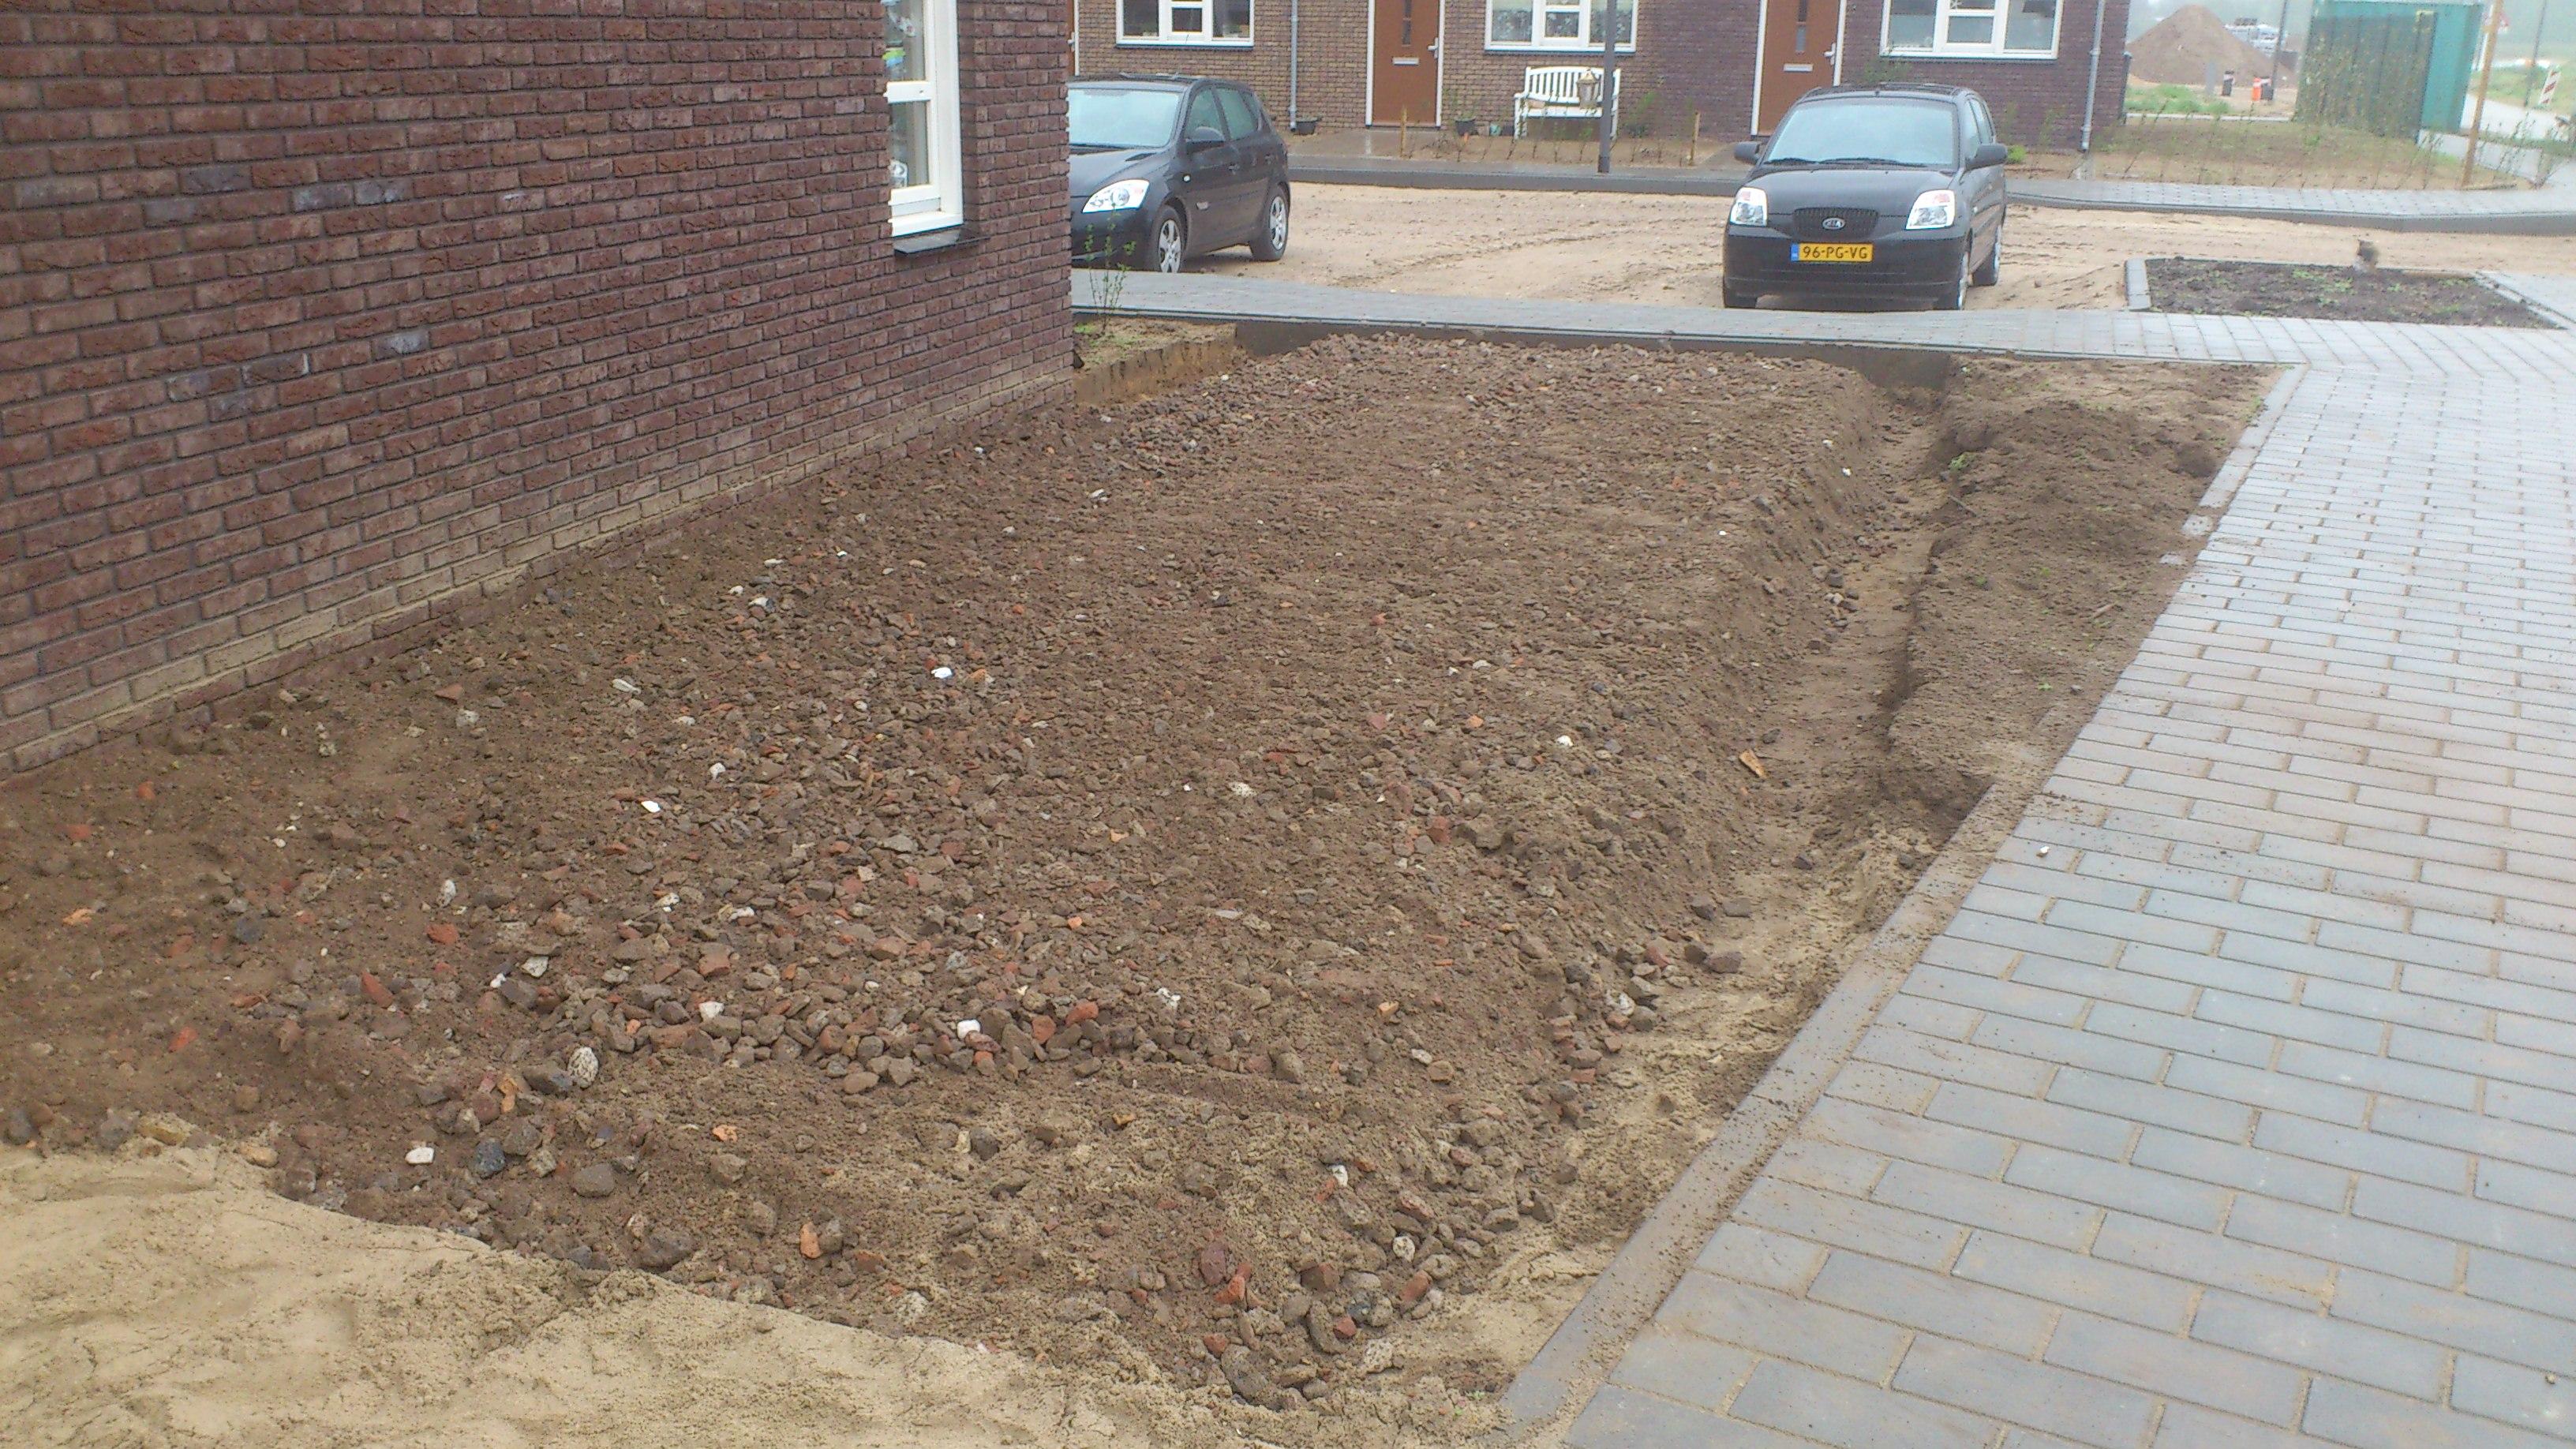 Tegels en bkk doetinchem tuinservice achterhoek - Oprit idee ...